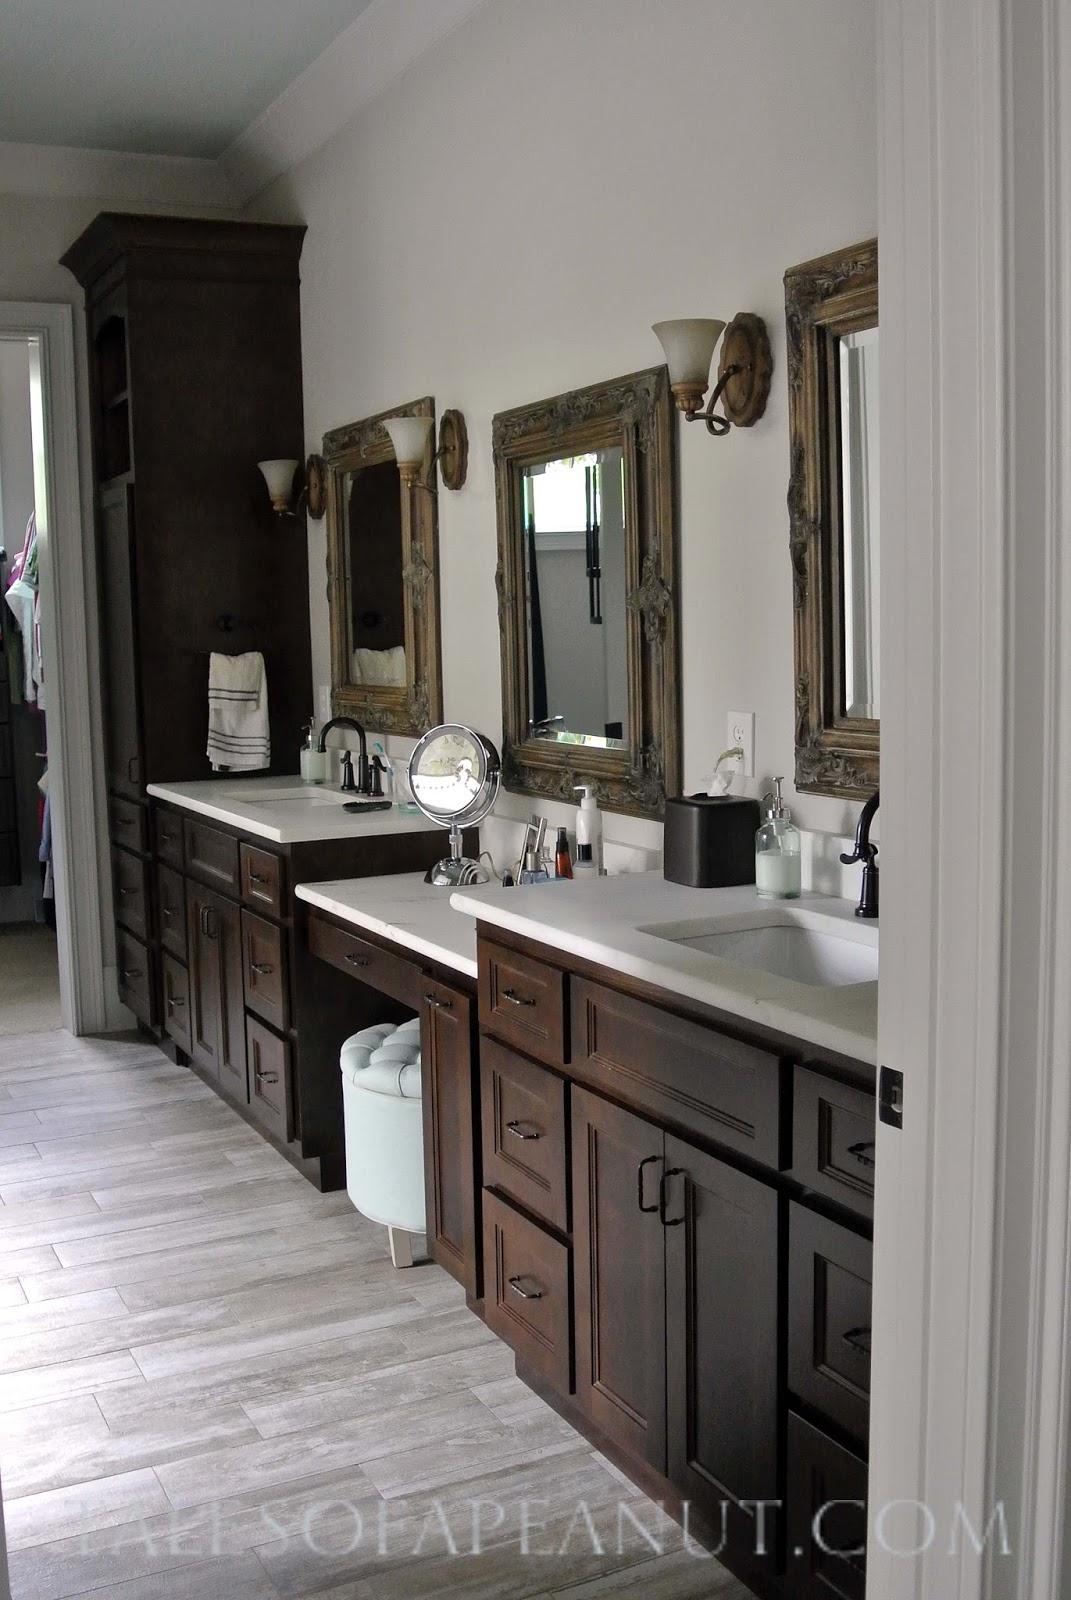 Building a Home - Master Bathroom Reveal - Jenn Elwell